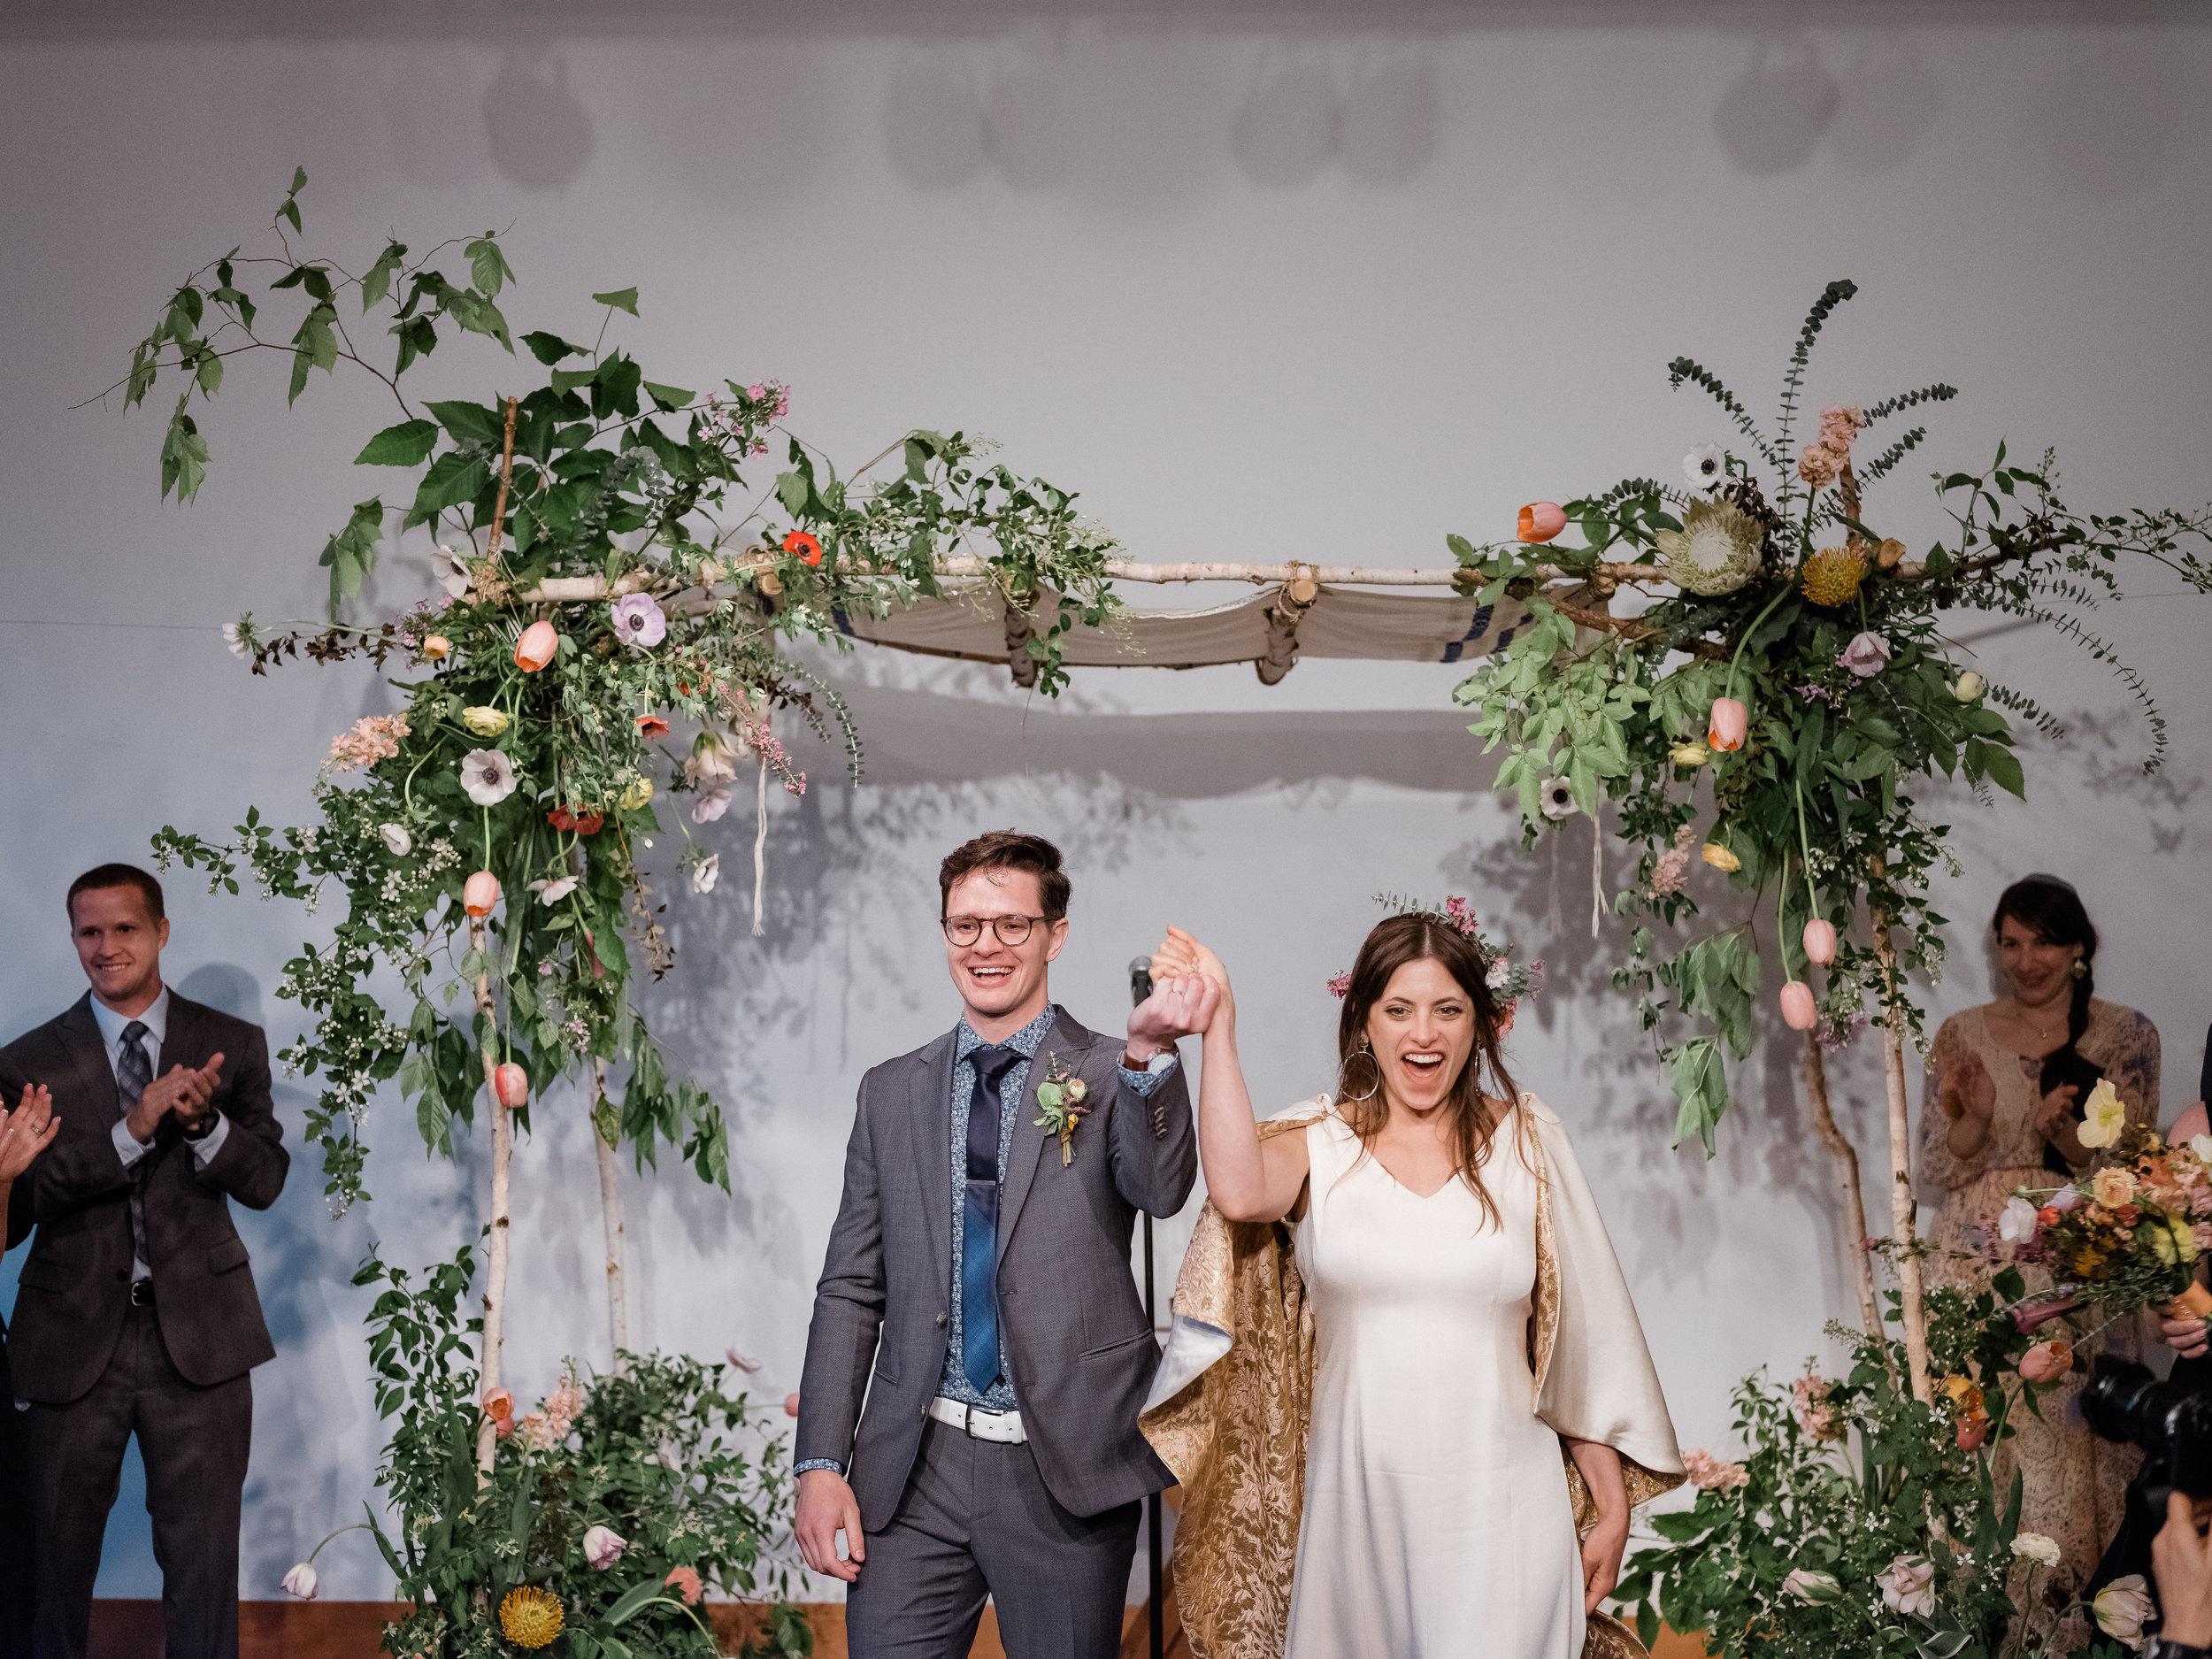 WSPCo-05272018-Aliya-Eric-Wedding-Sneak-Peek-29.jpg